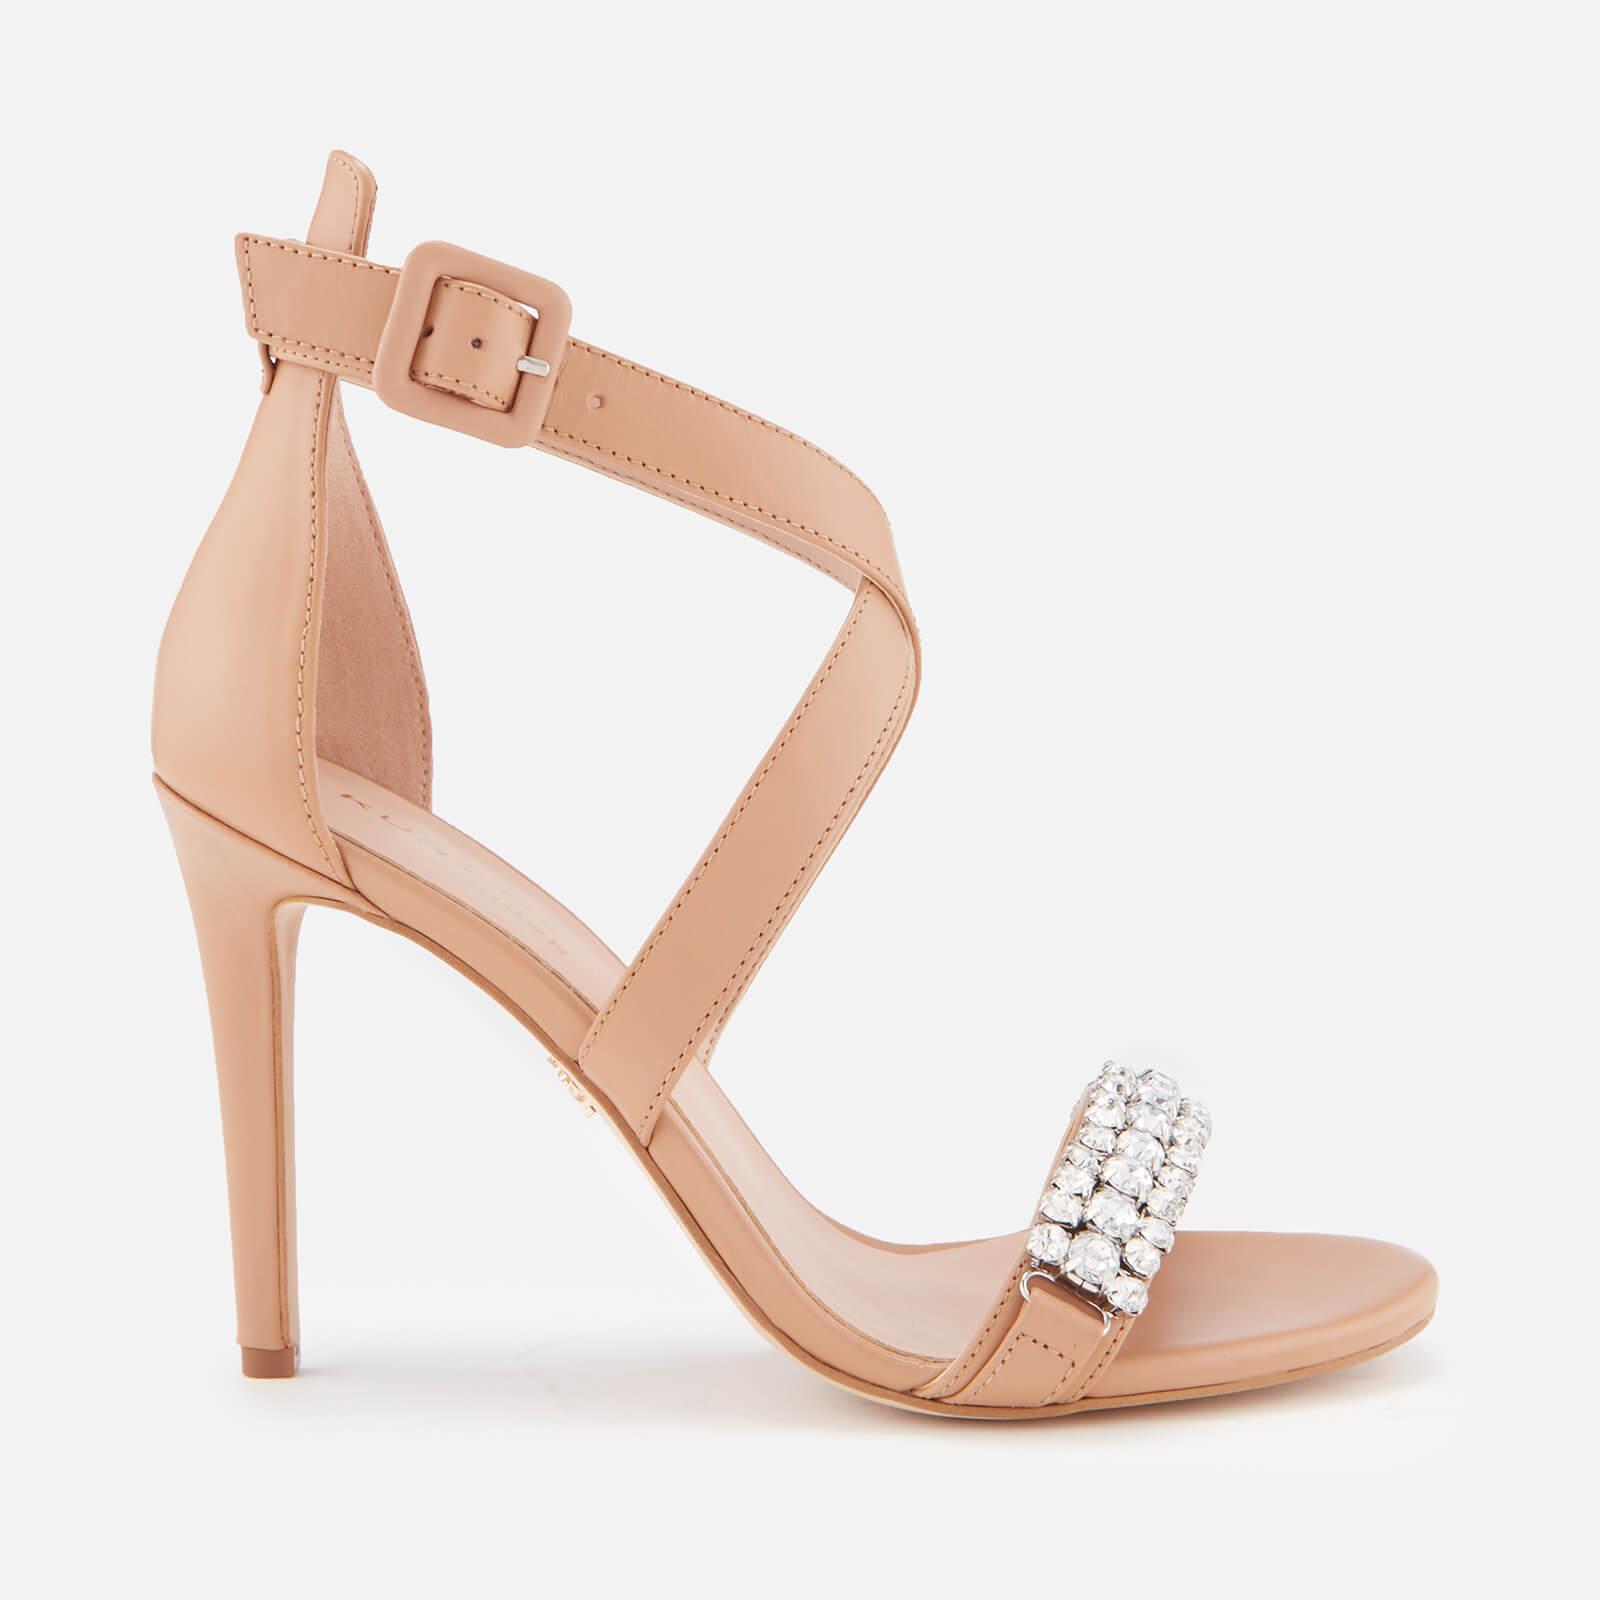 Kurt Geiger London Women's Knightsbridge Crystal Leather Heeled Sandals - Camel - UK 3 - Beige